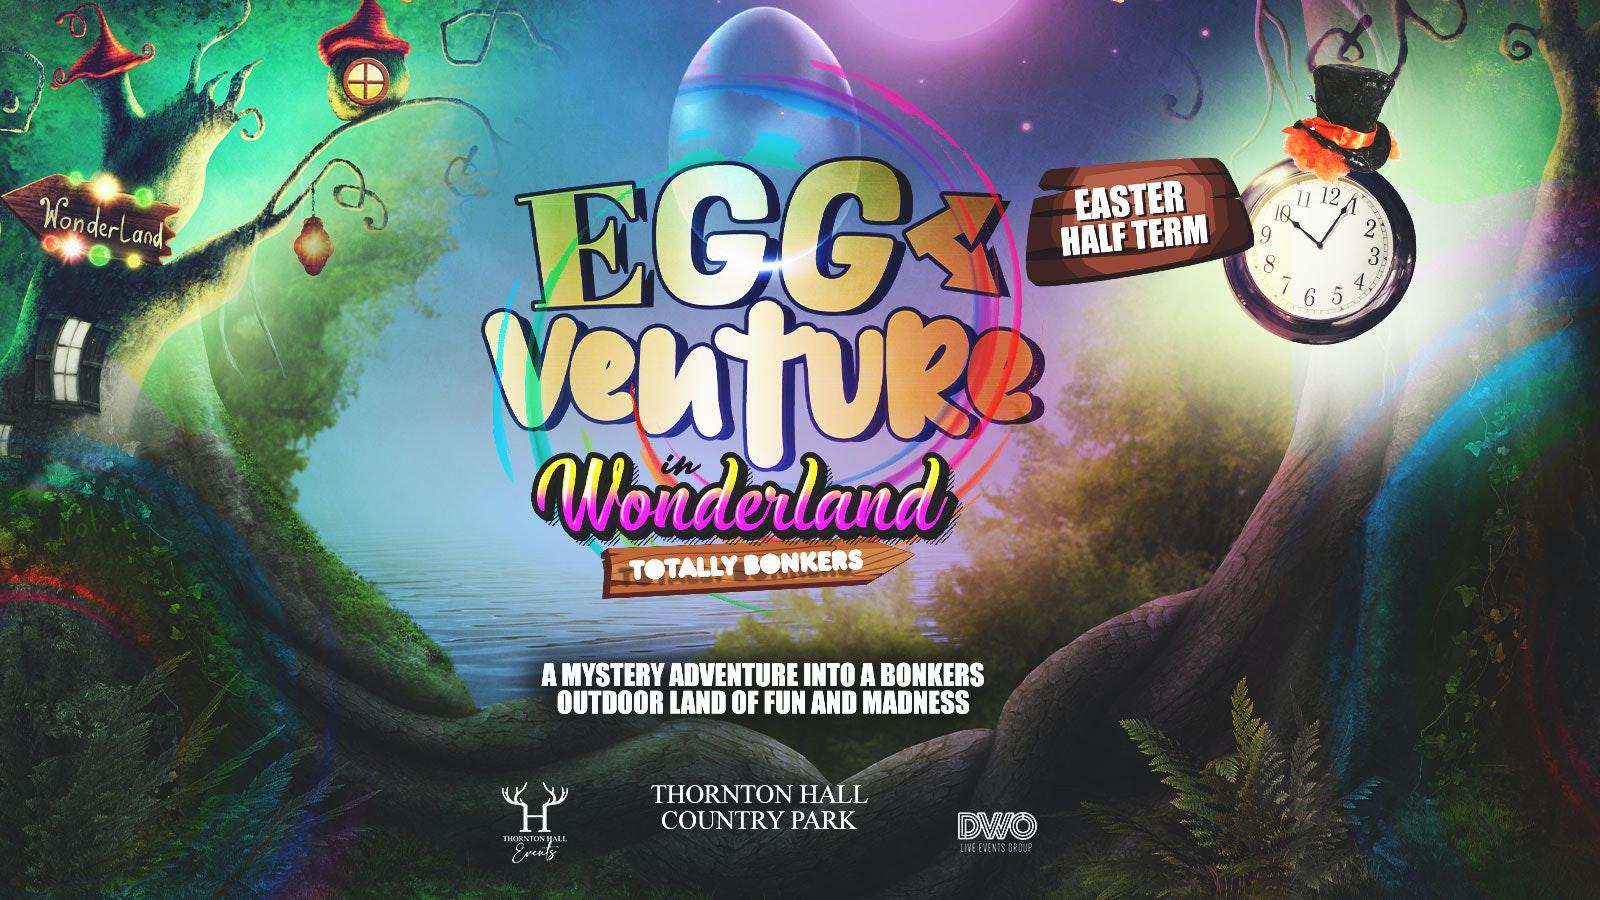 EggVenture in Wonderland – Saturday 10th April – 2pm